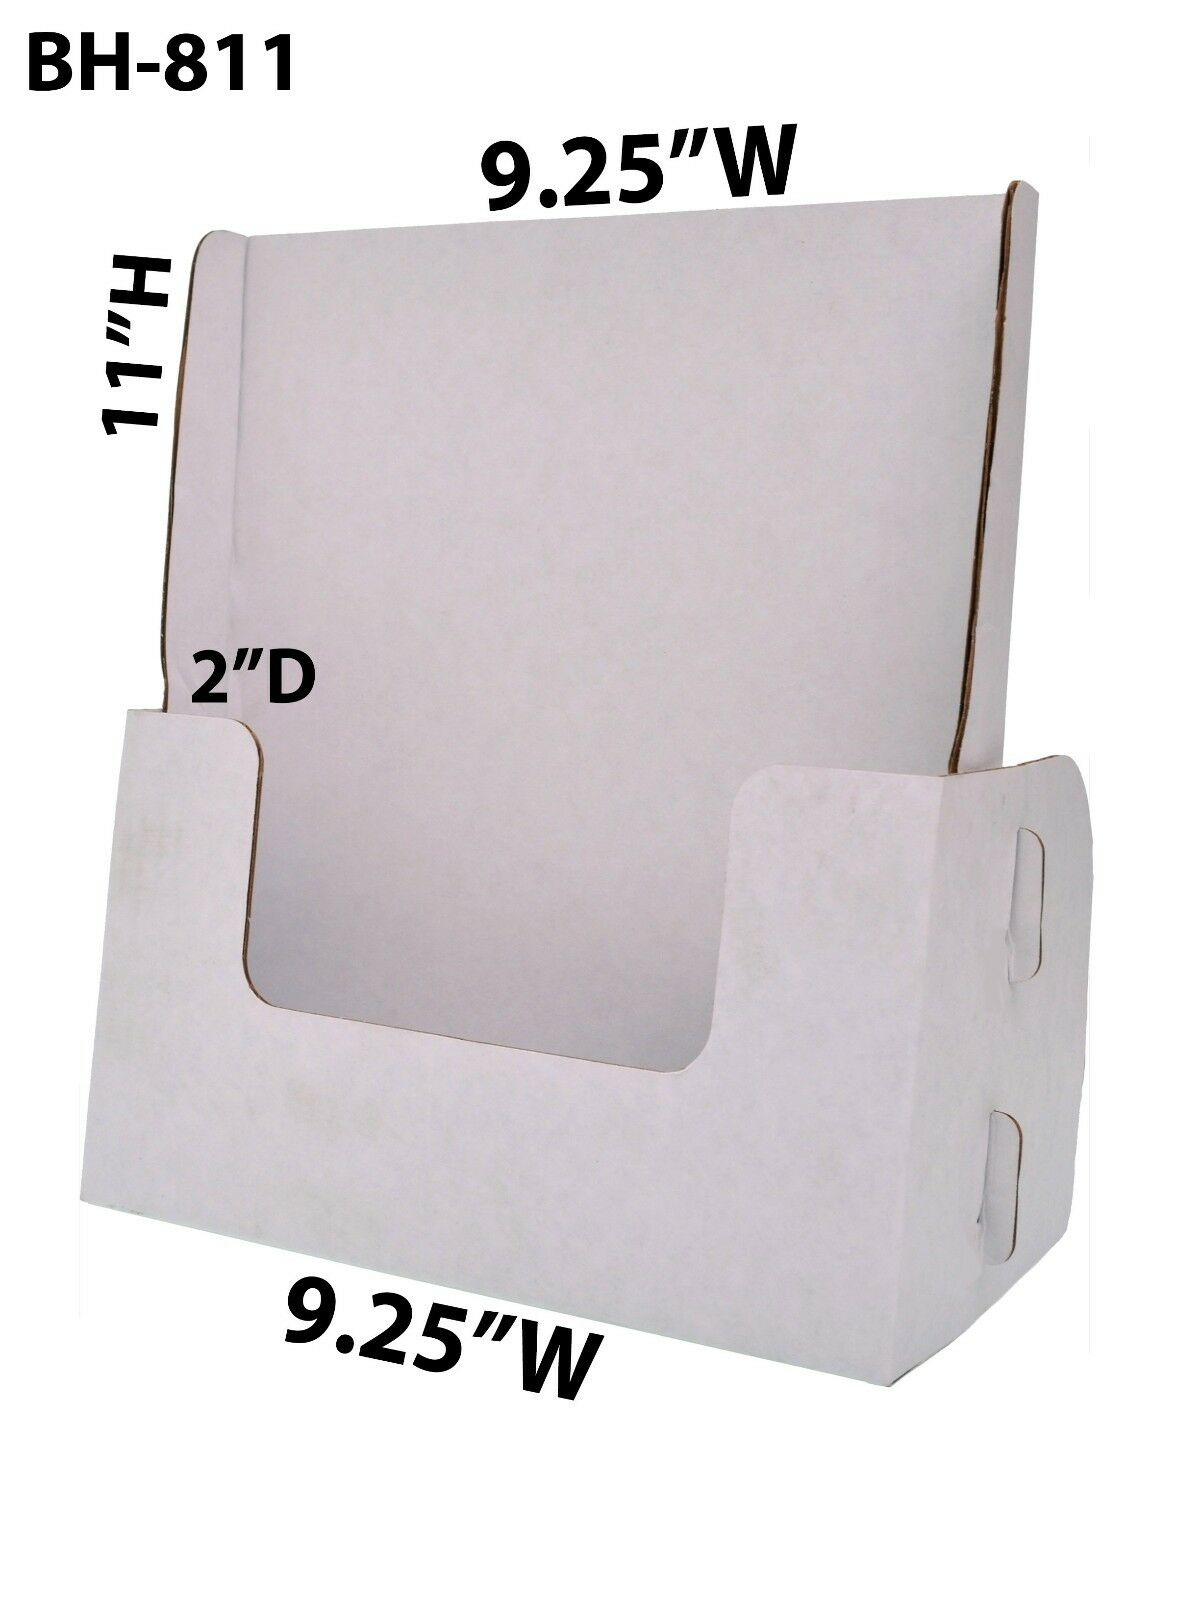 Cardboard Brochure Holder 9 1 4  x 11  Magazine Countertop Displays Lot of 100